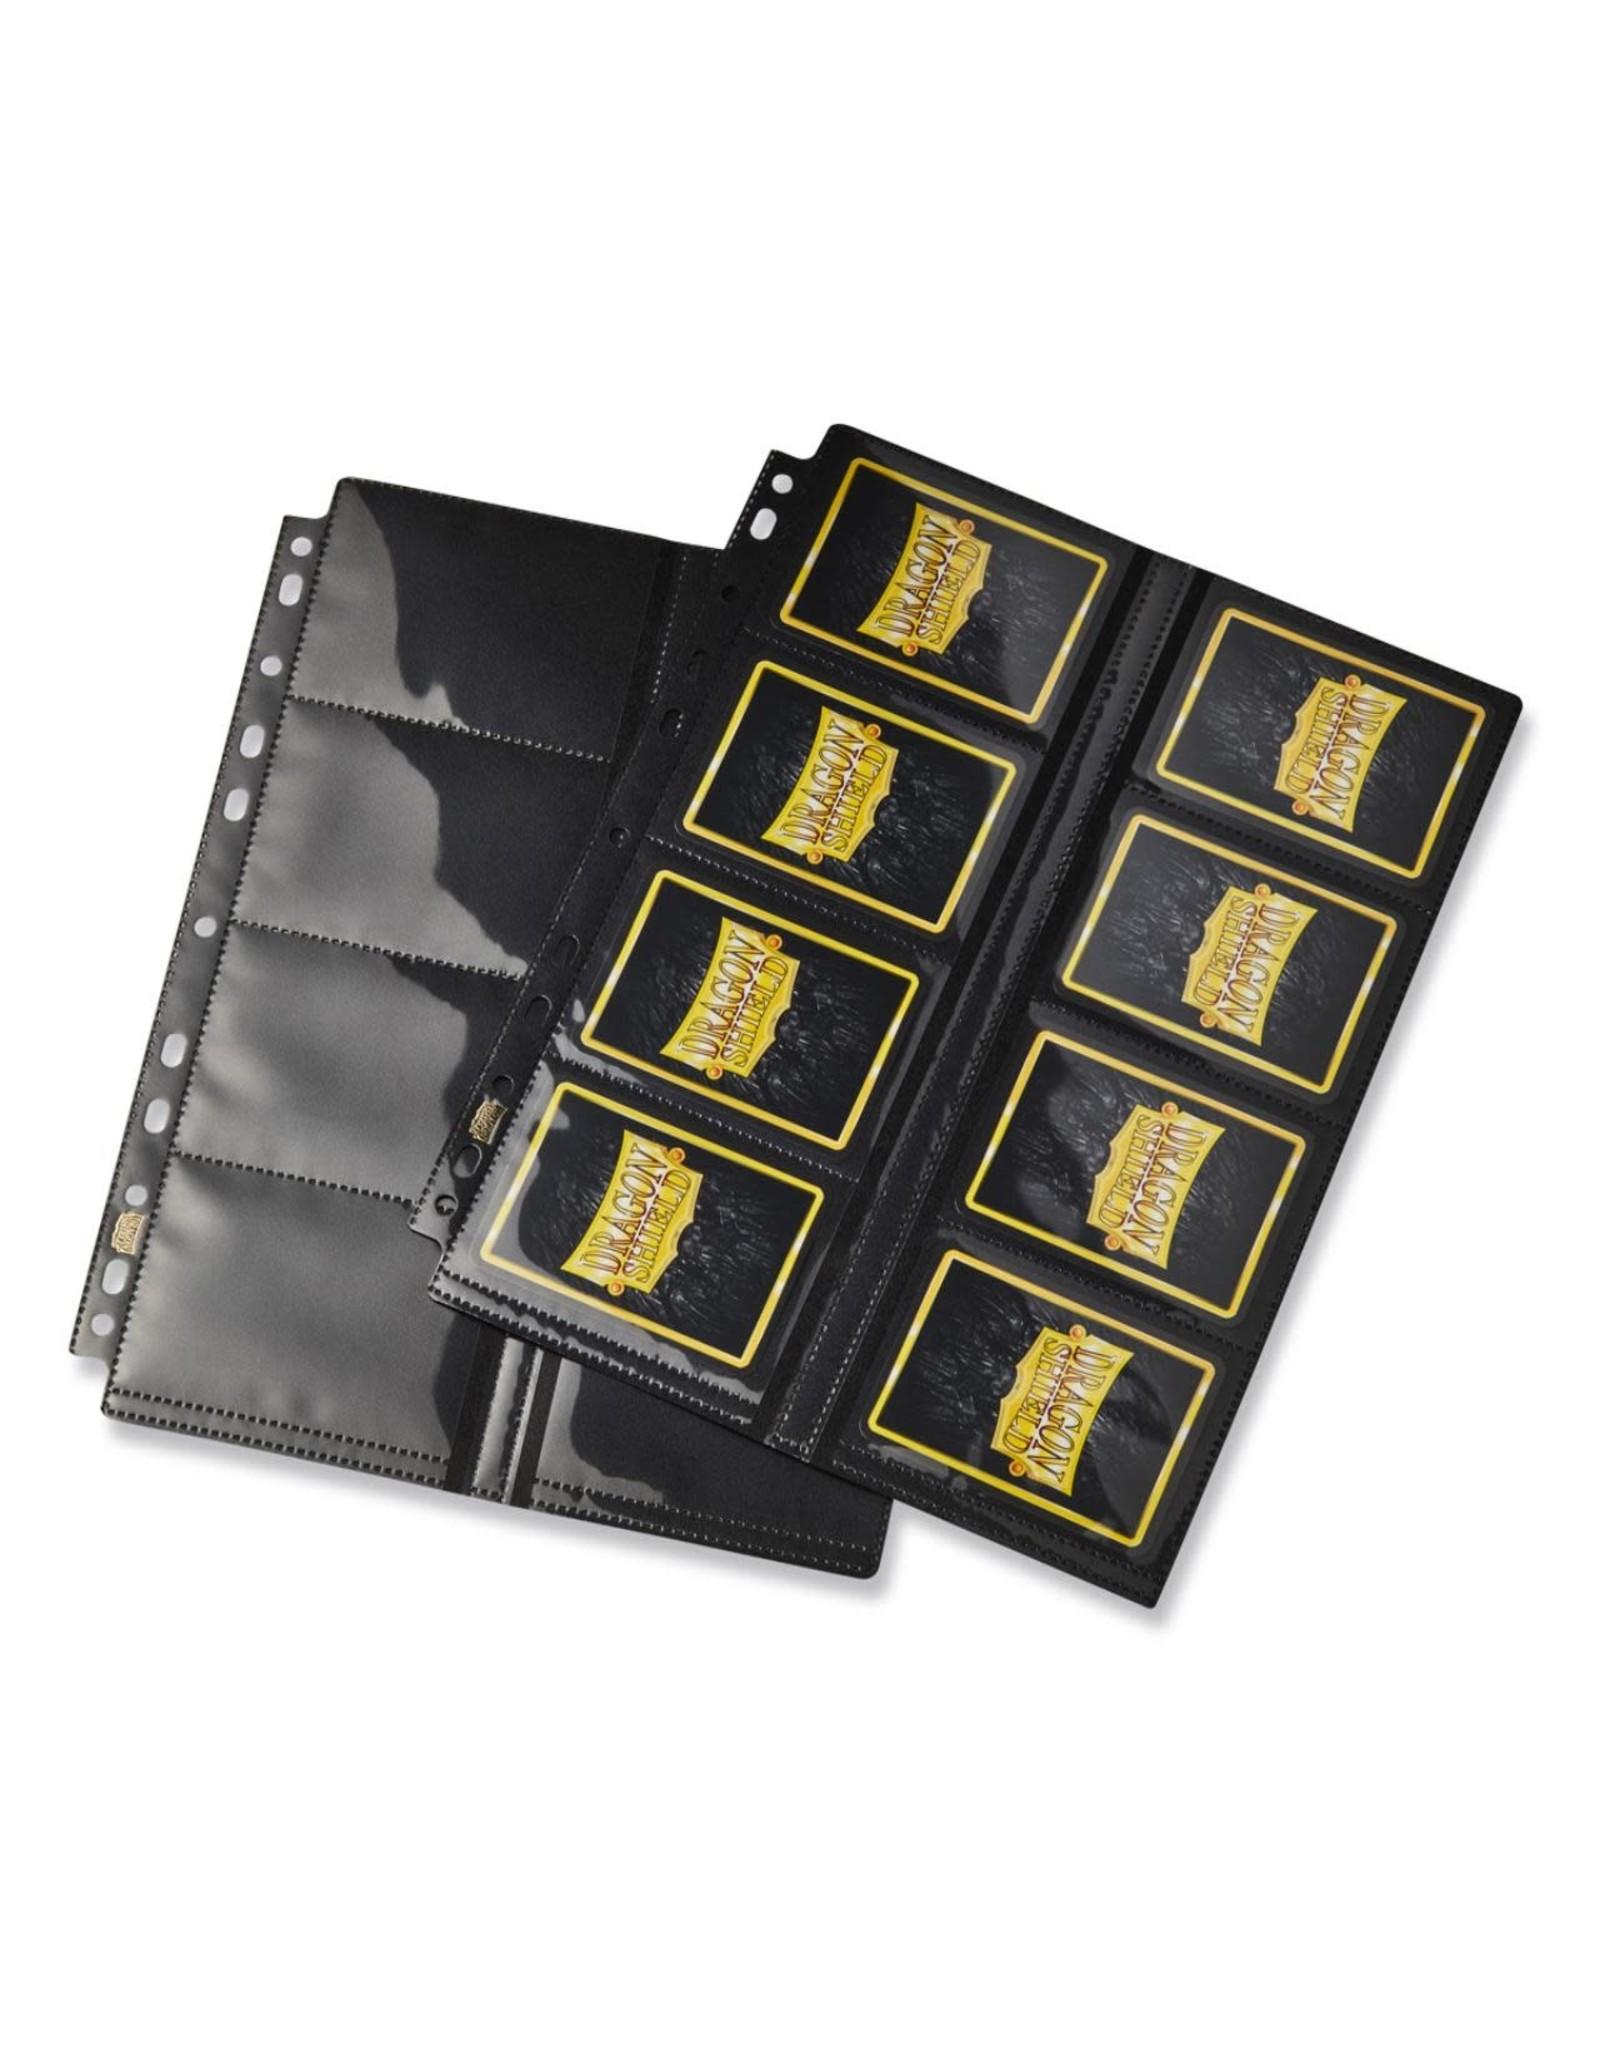 Dragon Shield 16-pocket pages single